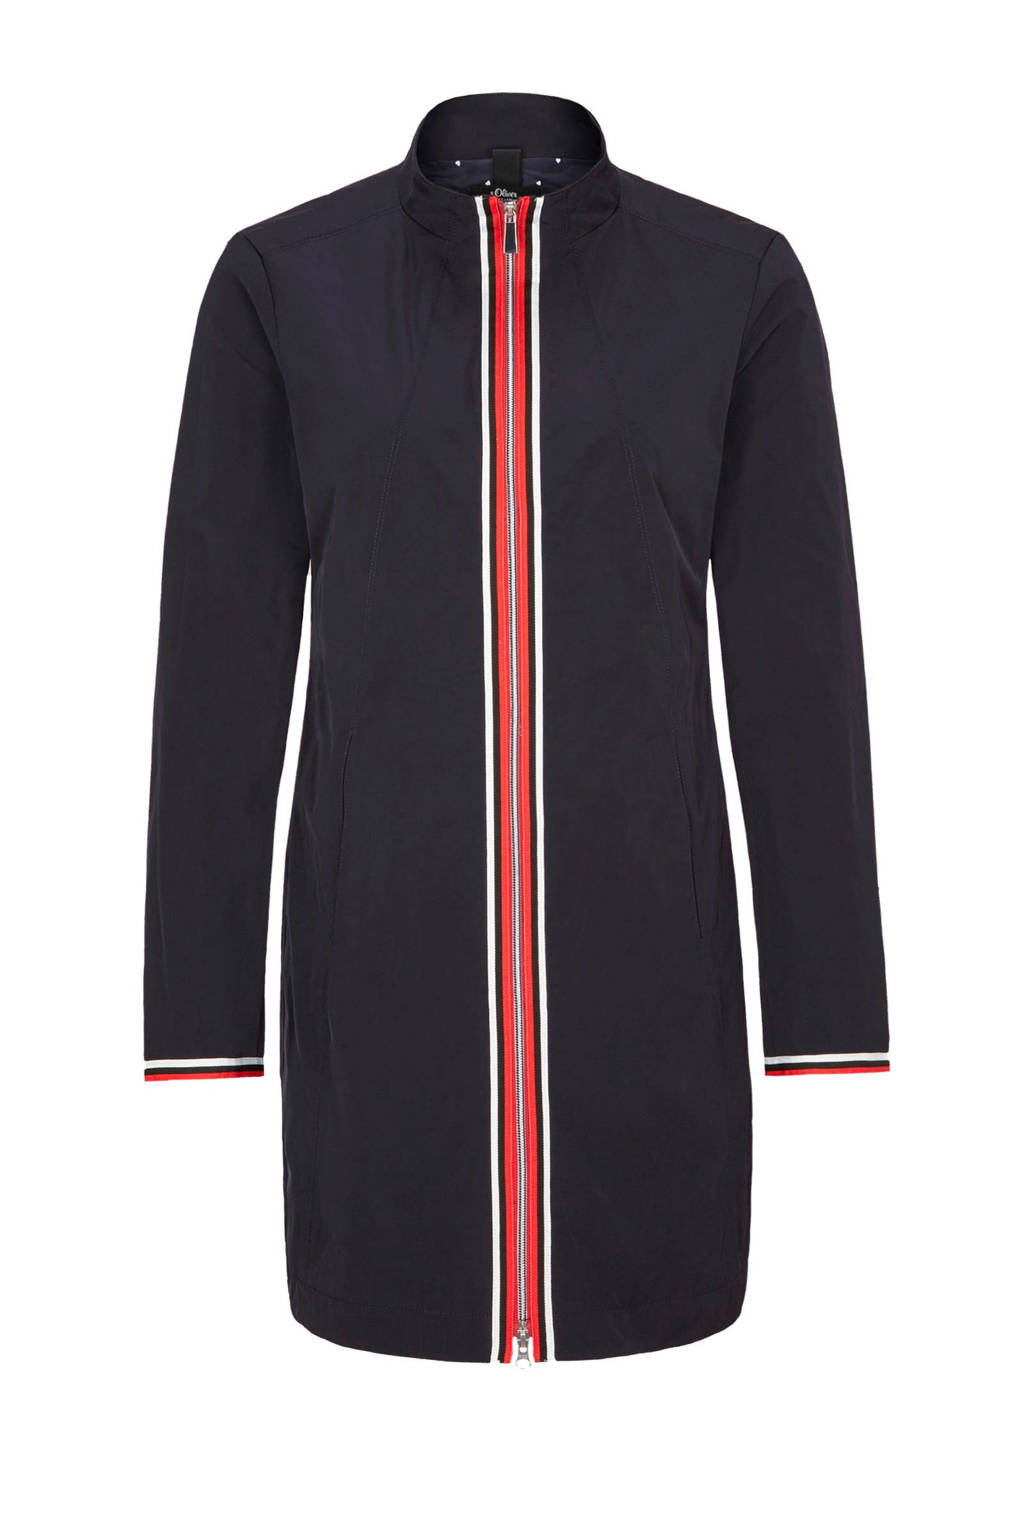 s.Oliver BLACK LABEL jas met opstaande kraag, Donkerblauw/rood/wit